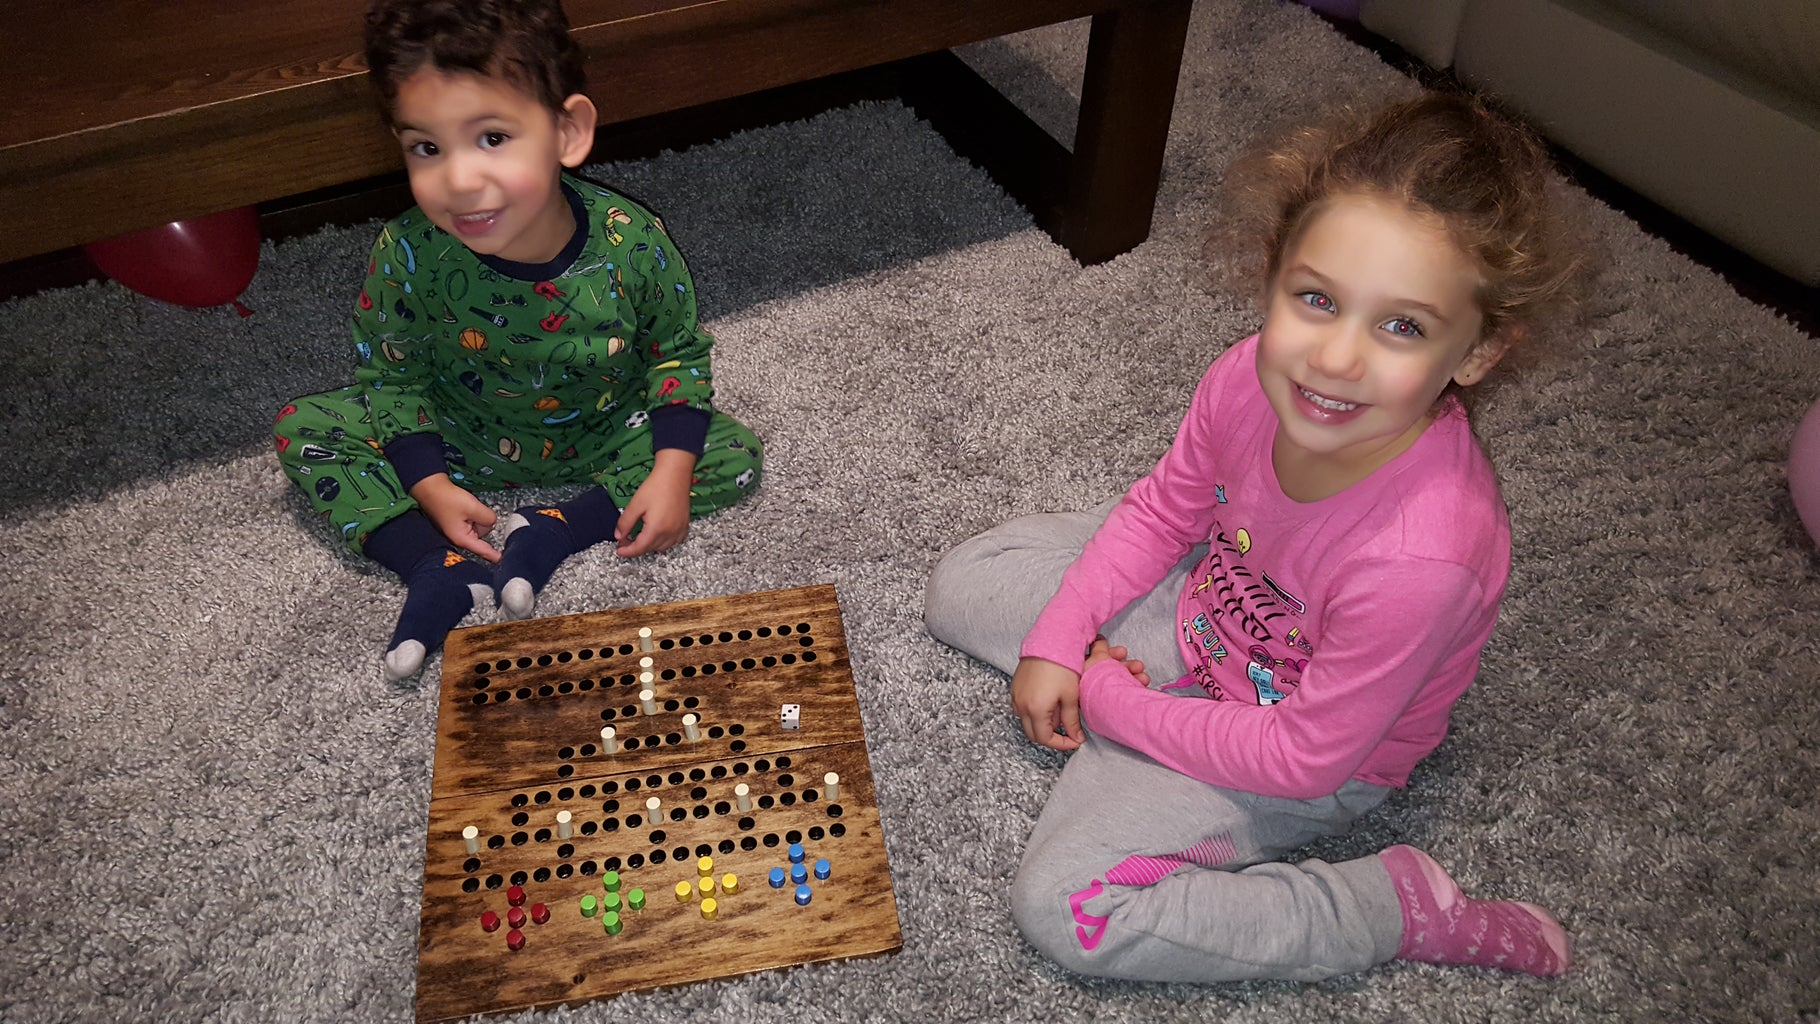 The Next Generation of Malefiz Players!